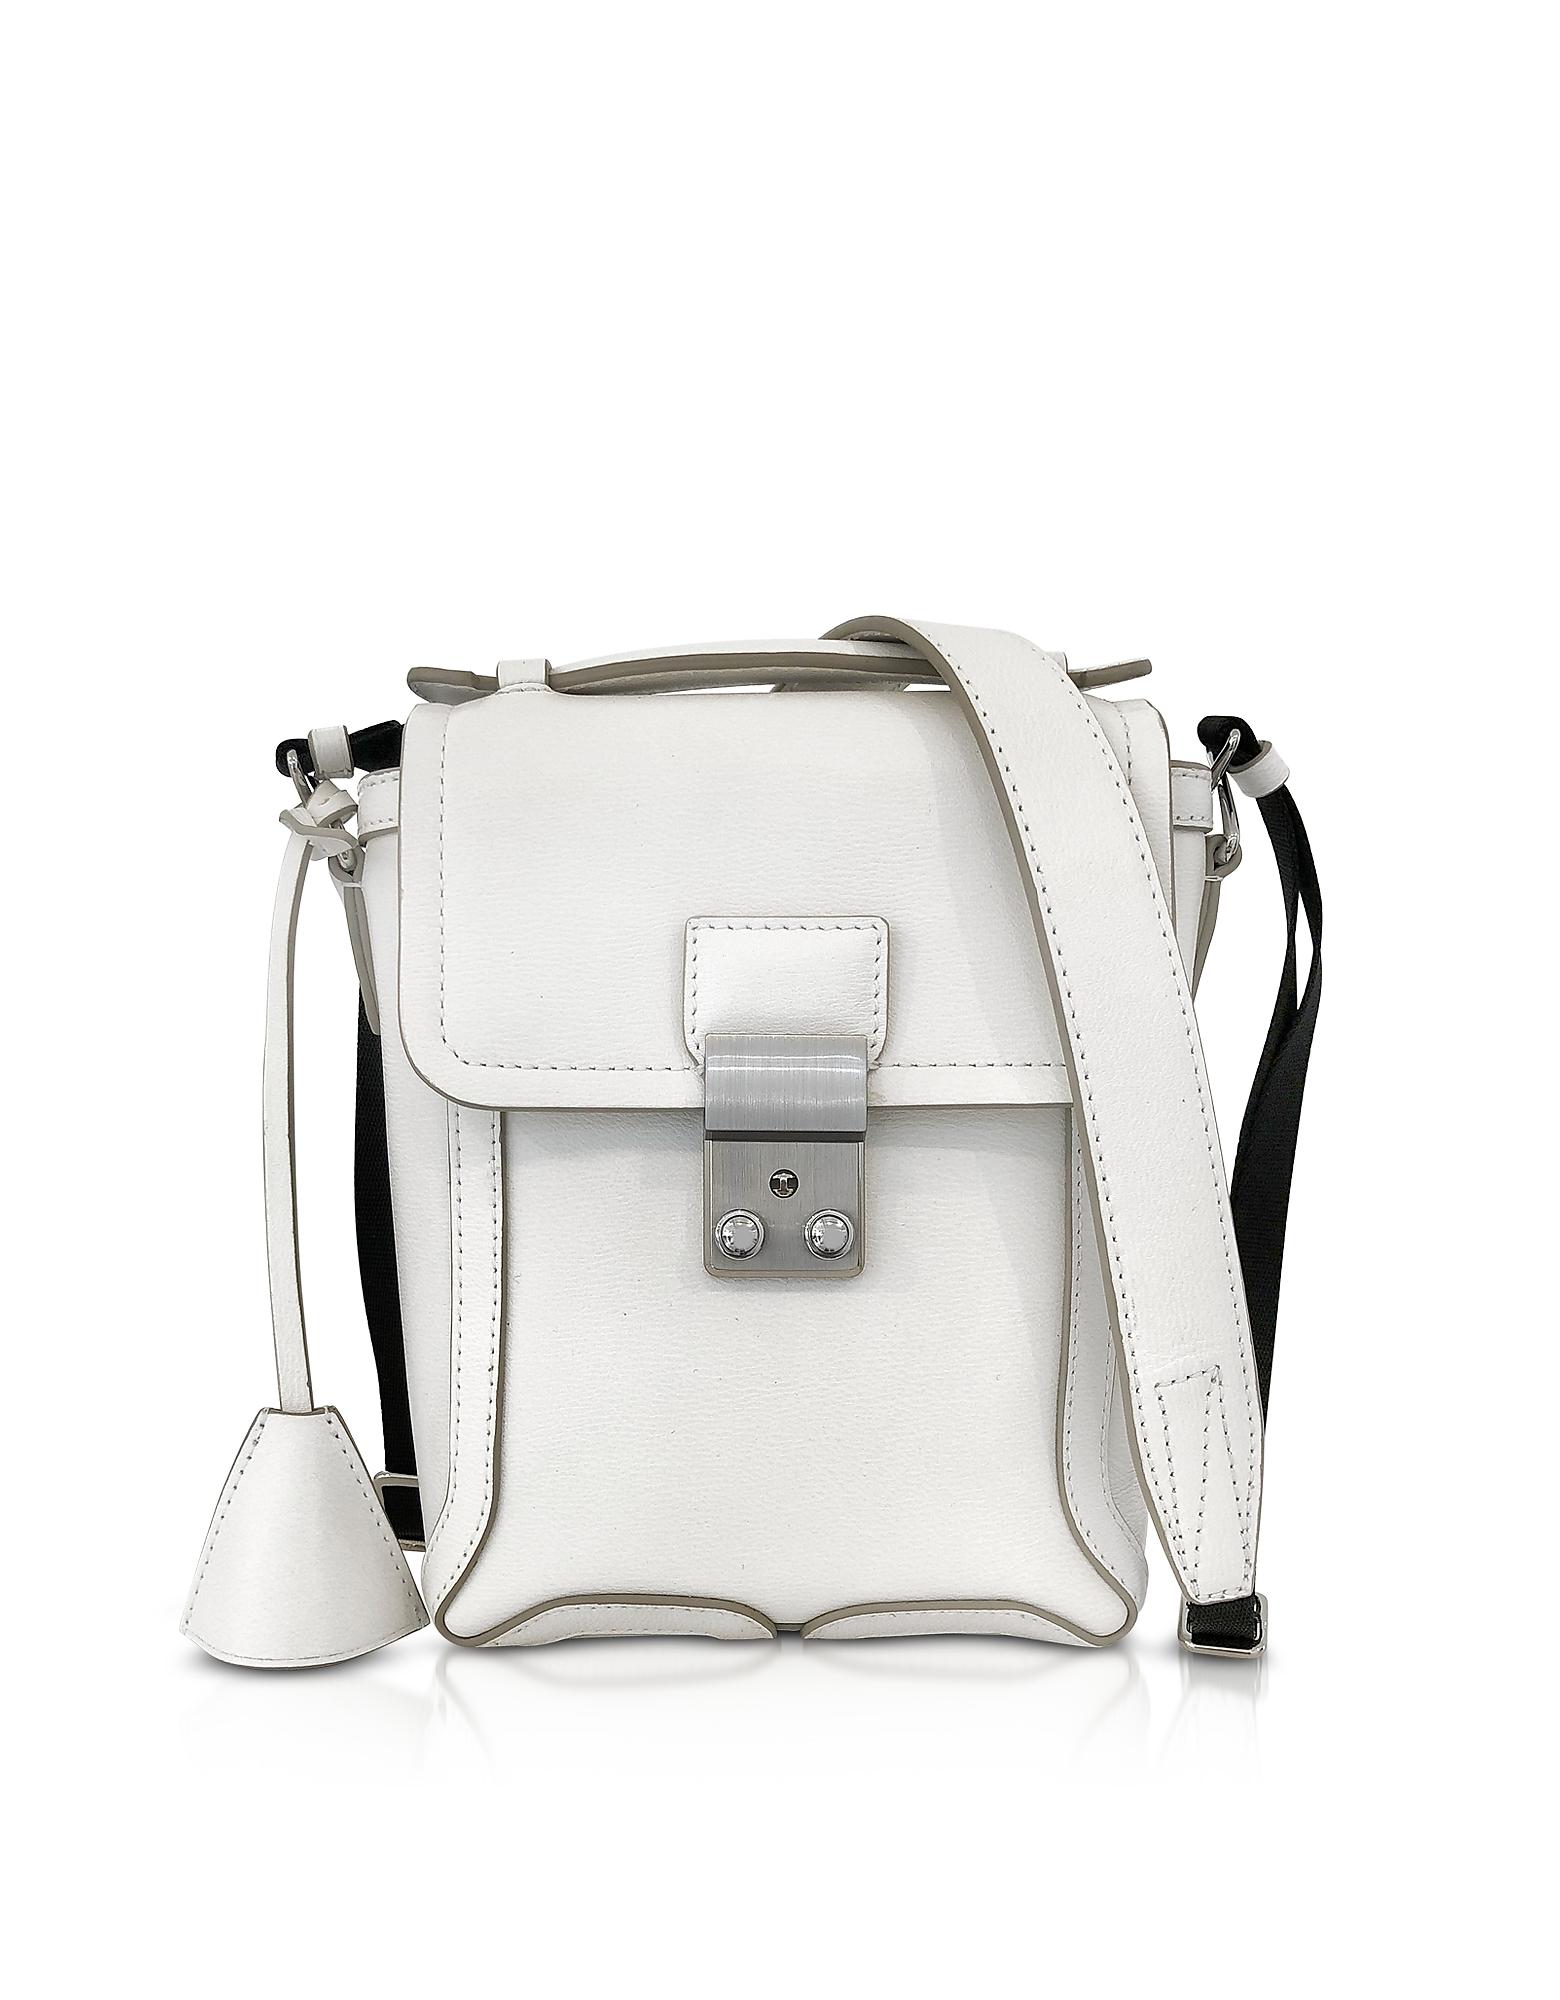 3.1 Phillip Lim Handbags, Pashli Camera Bag